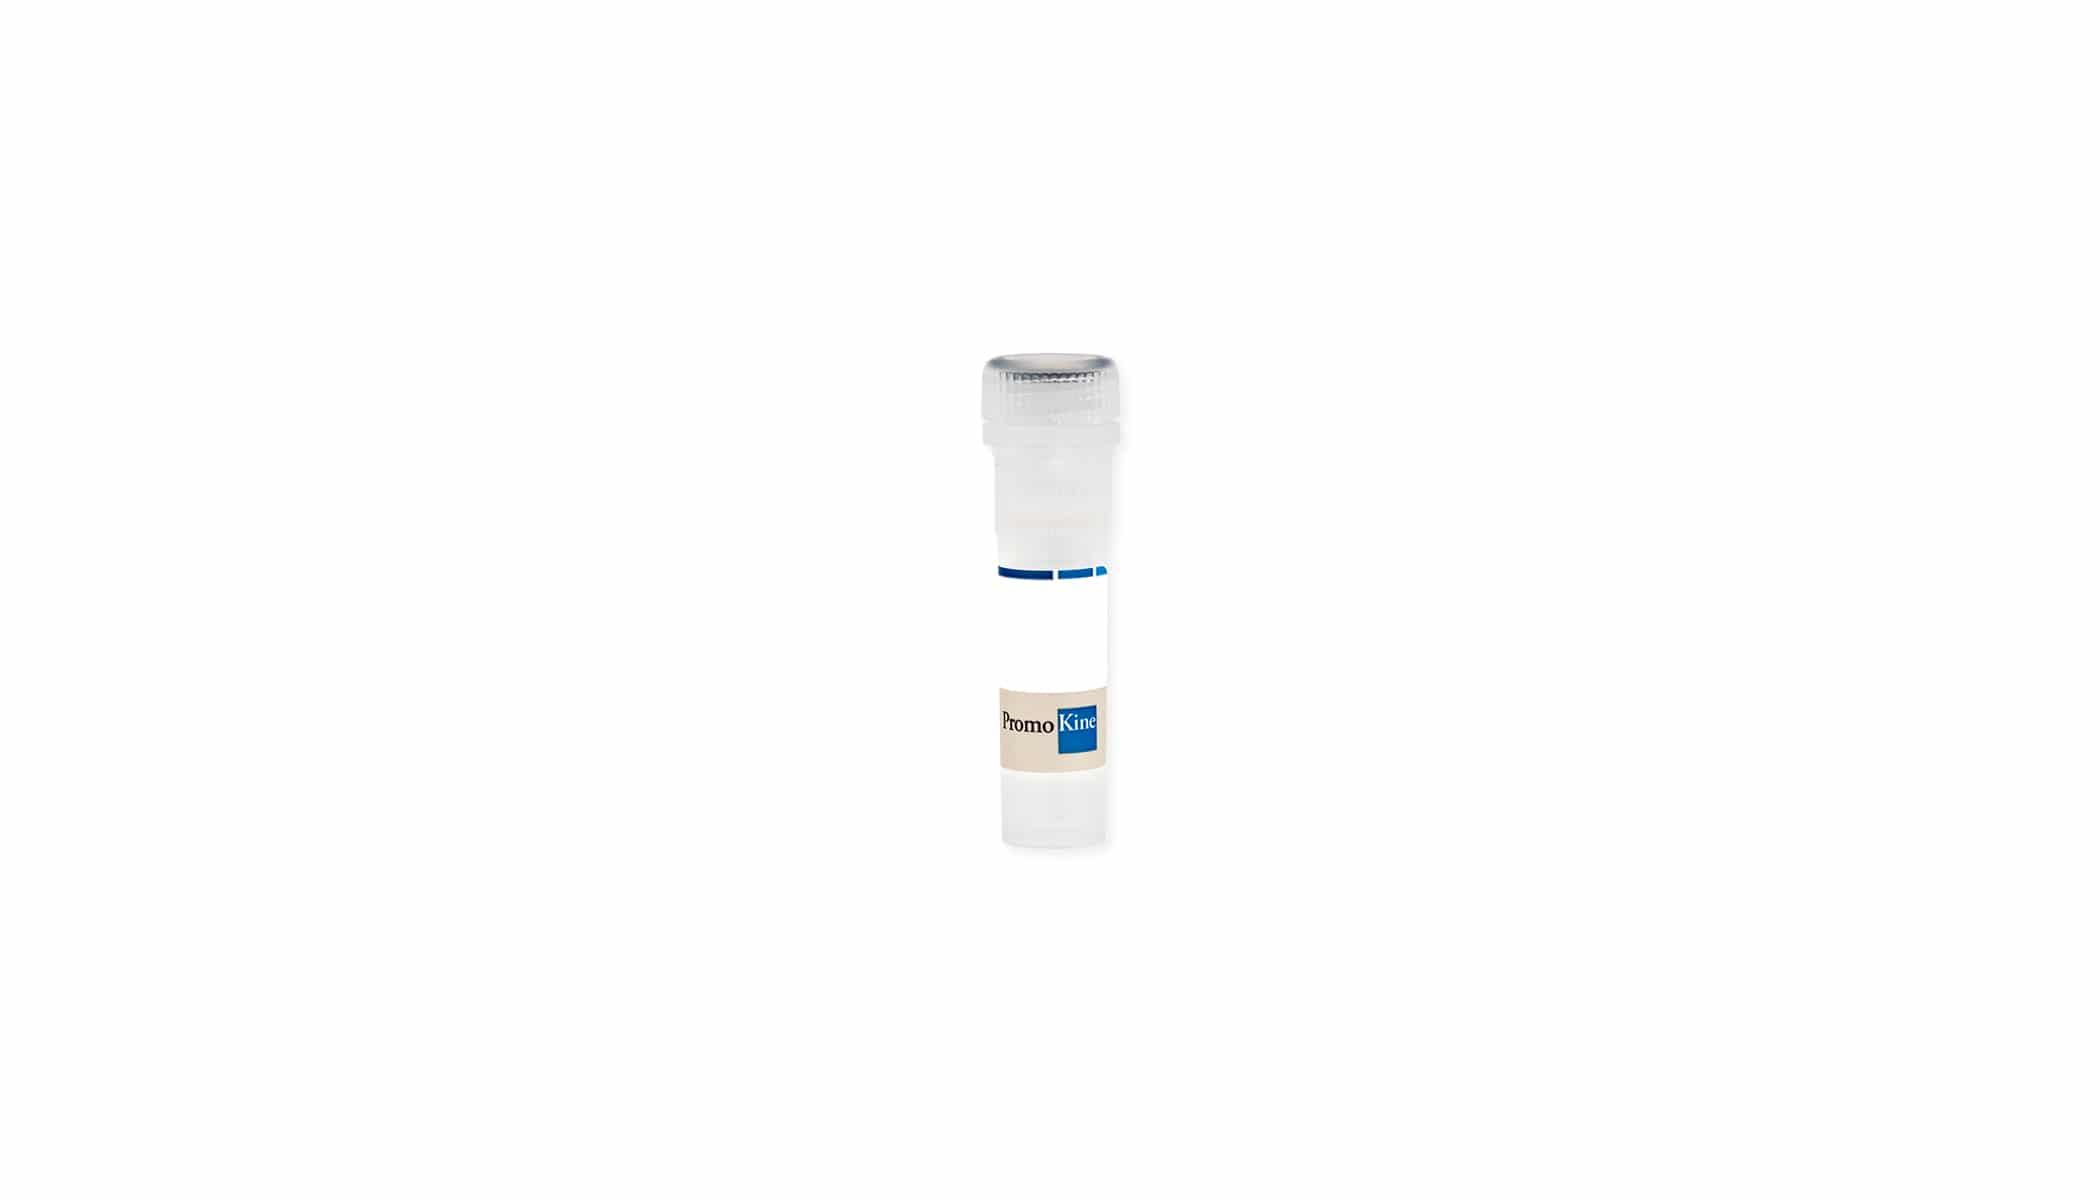 Zoledronic acid hydrate